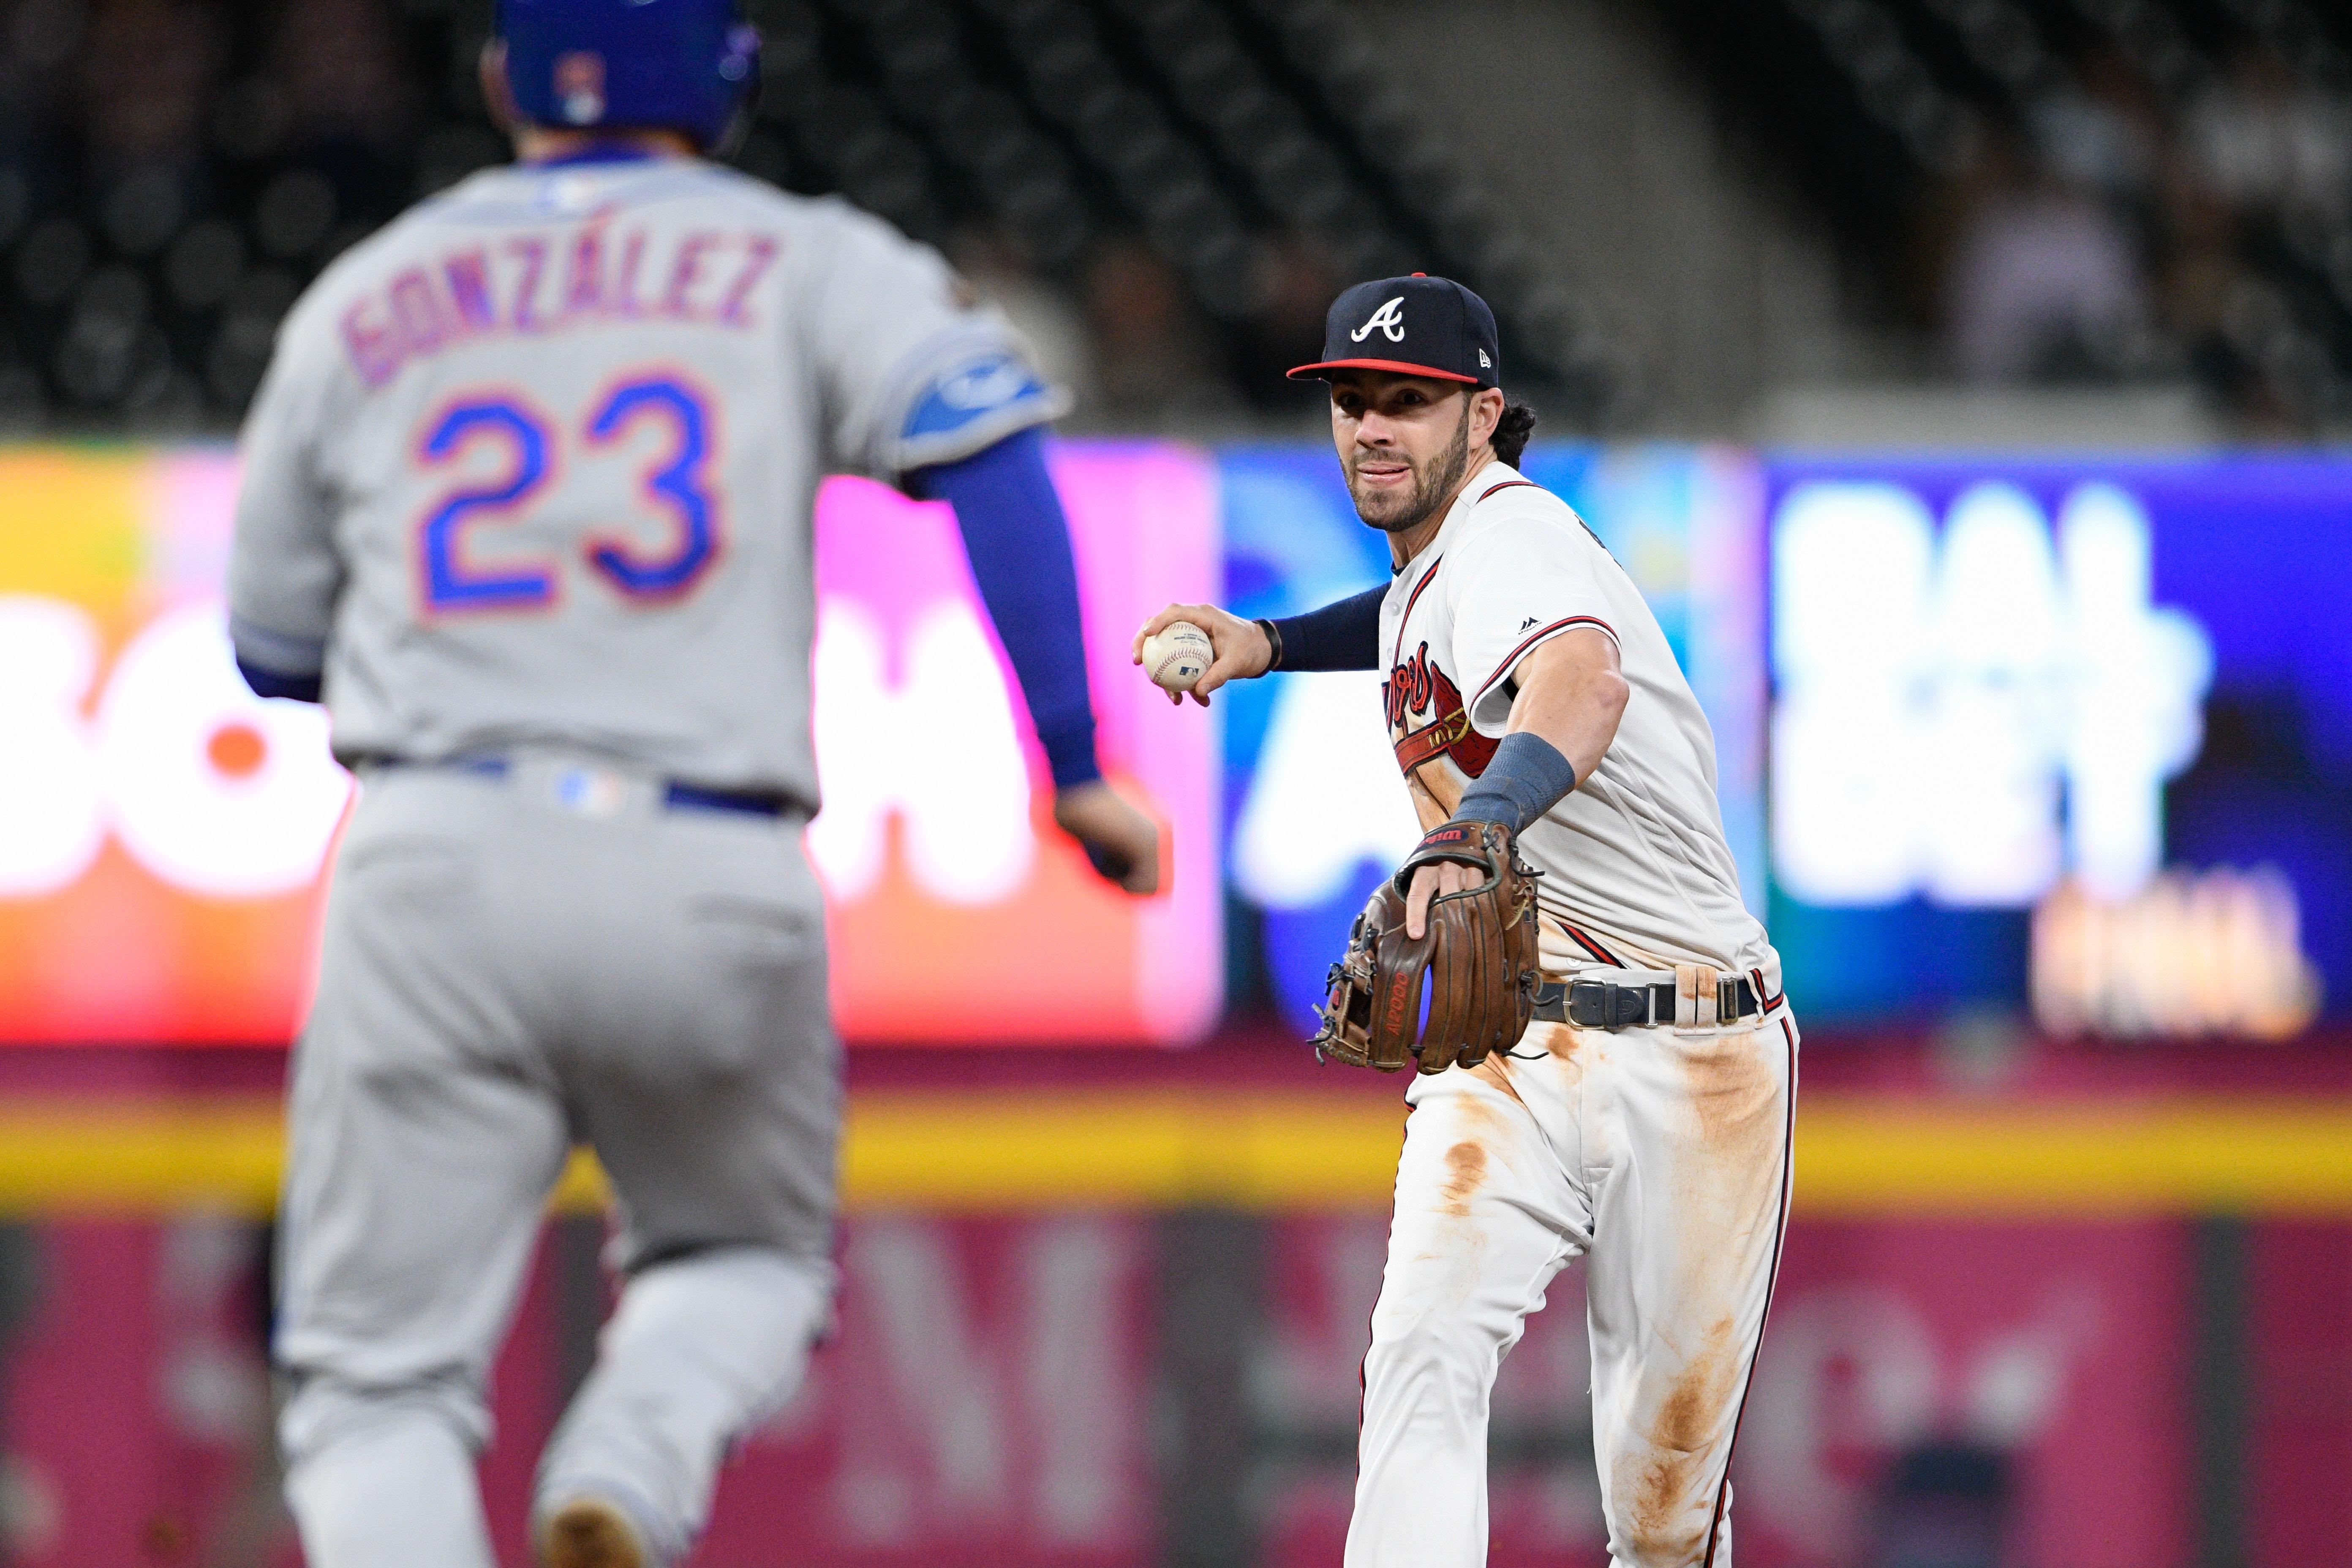 4/20/18 Game Preview: New York Mets at Atlanta Braves